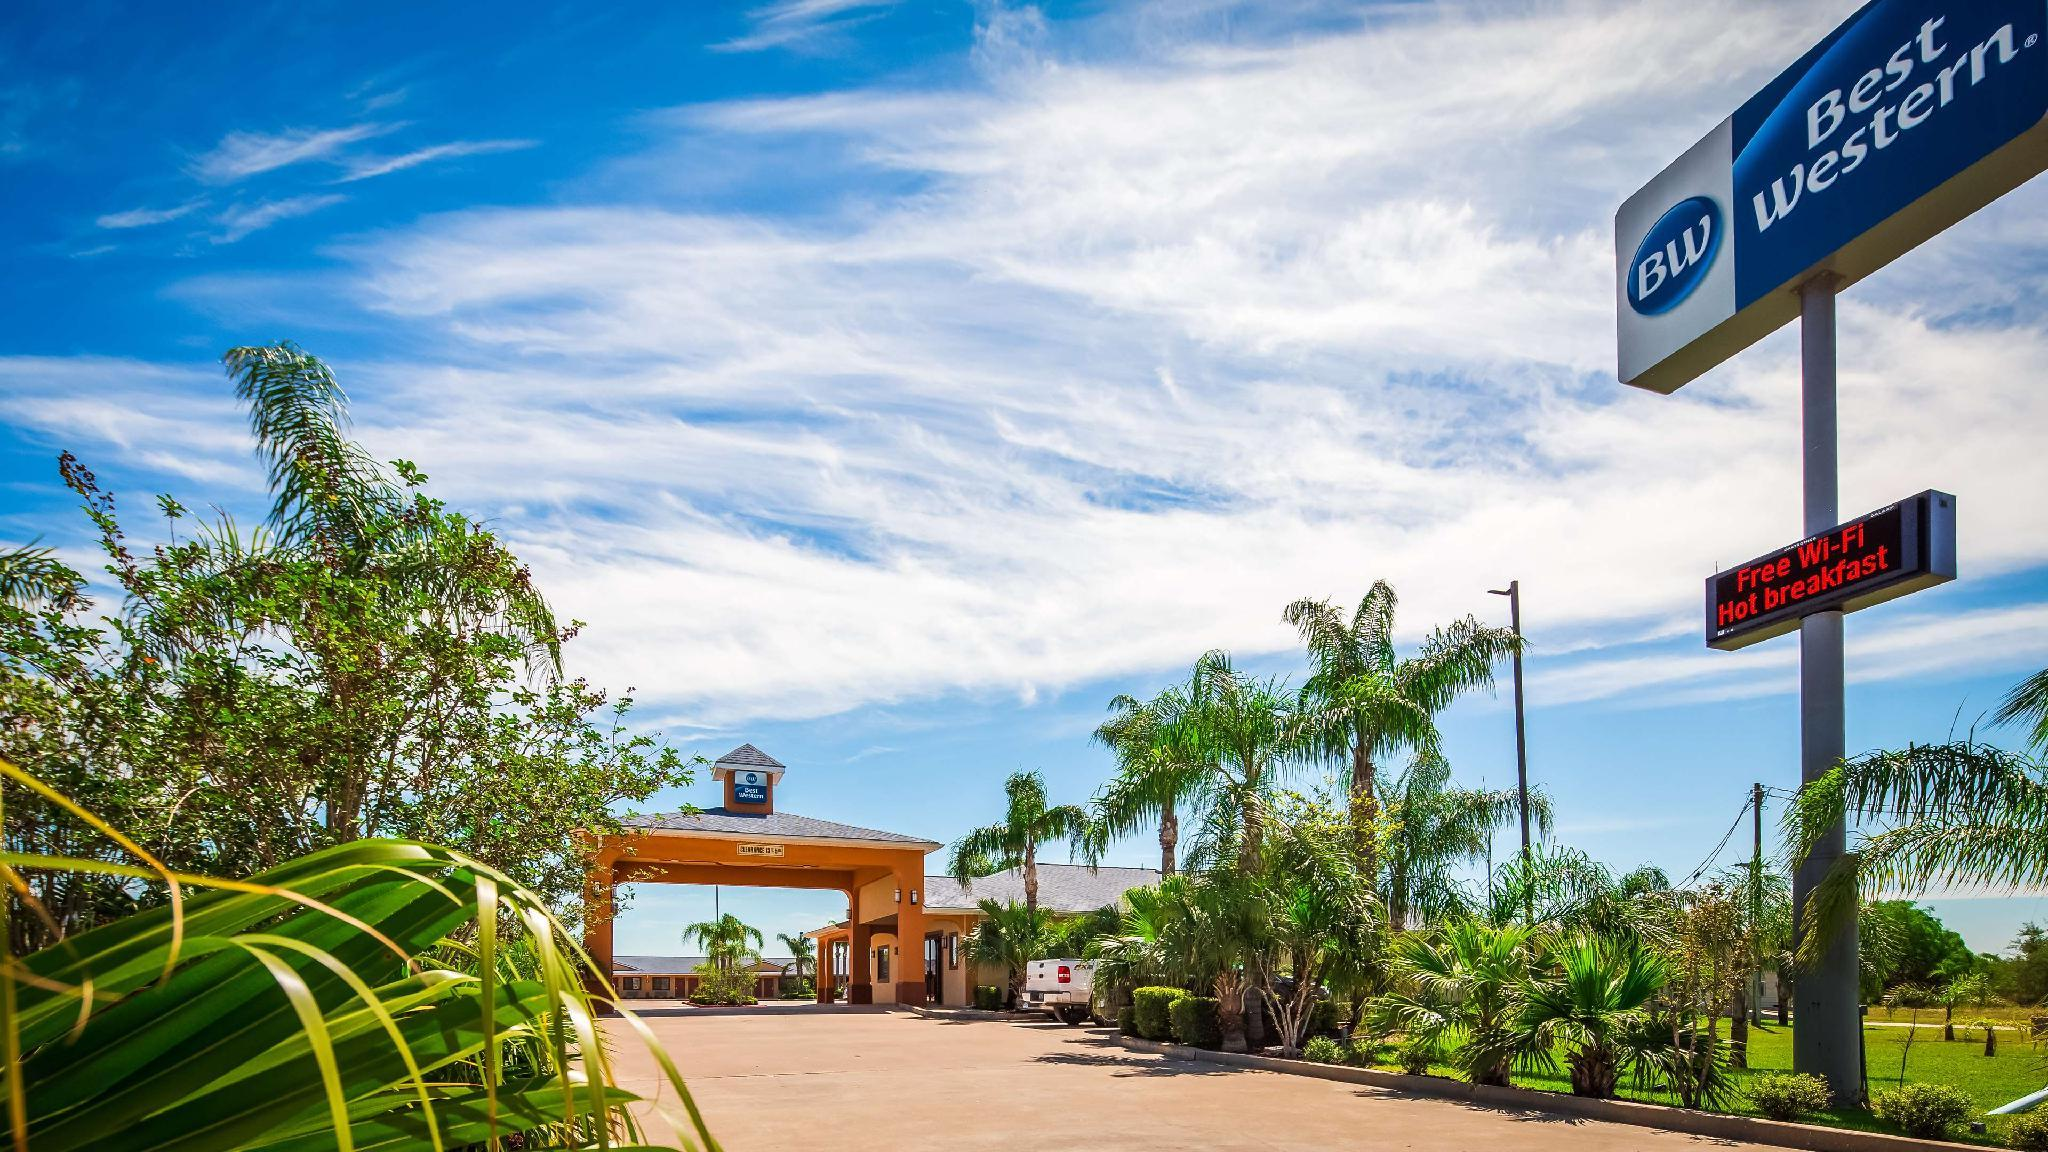 SureStay Hotel By Best Western Falfurrias